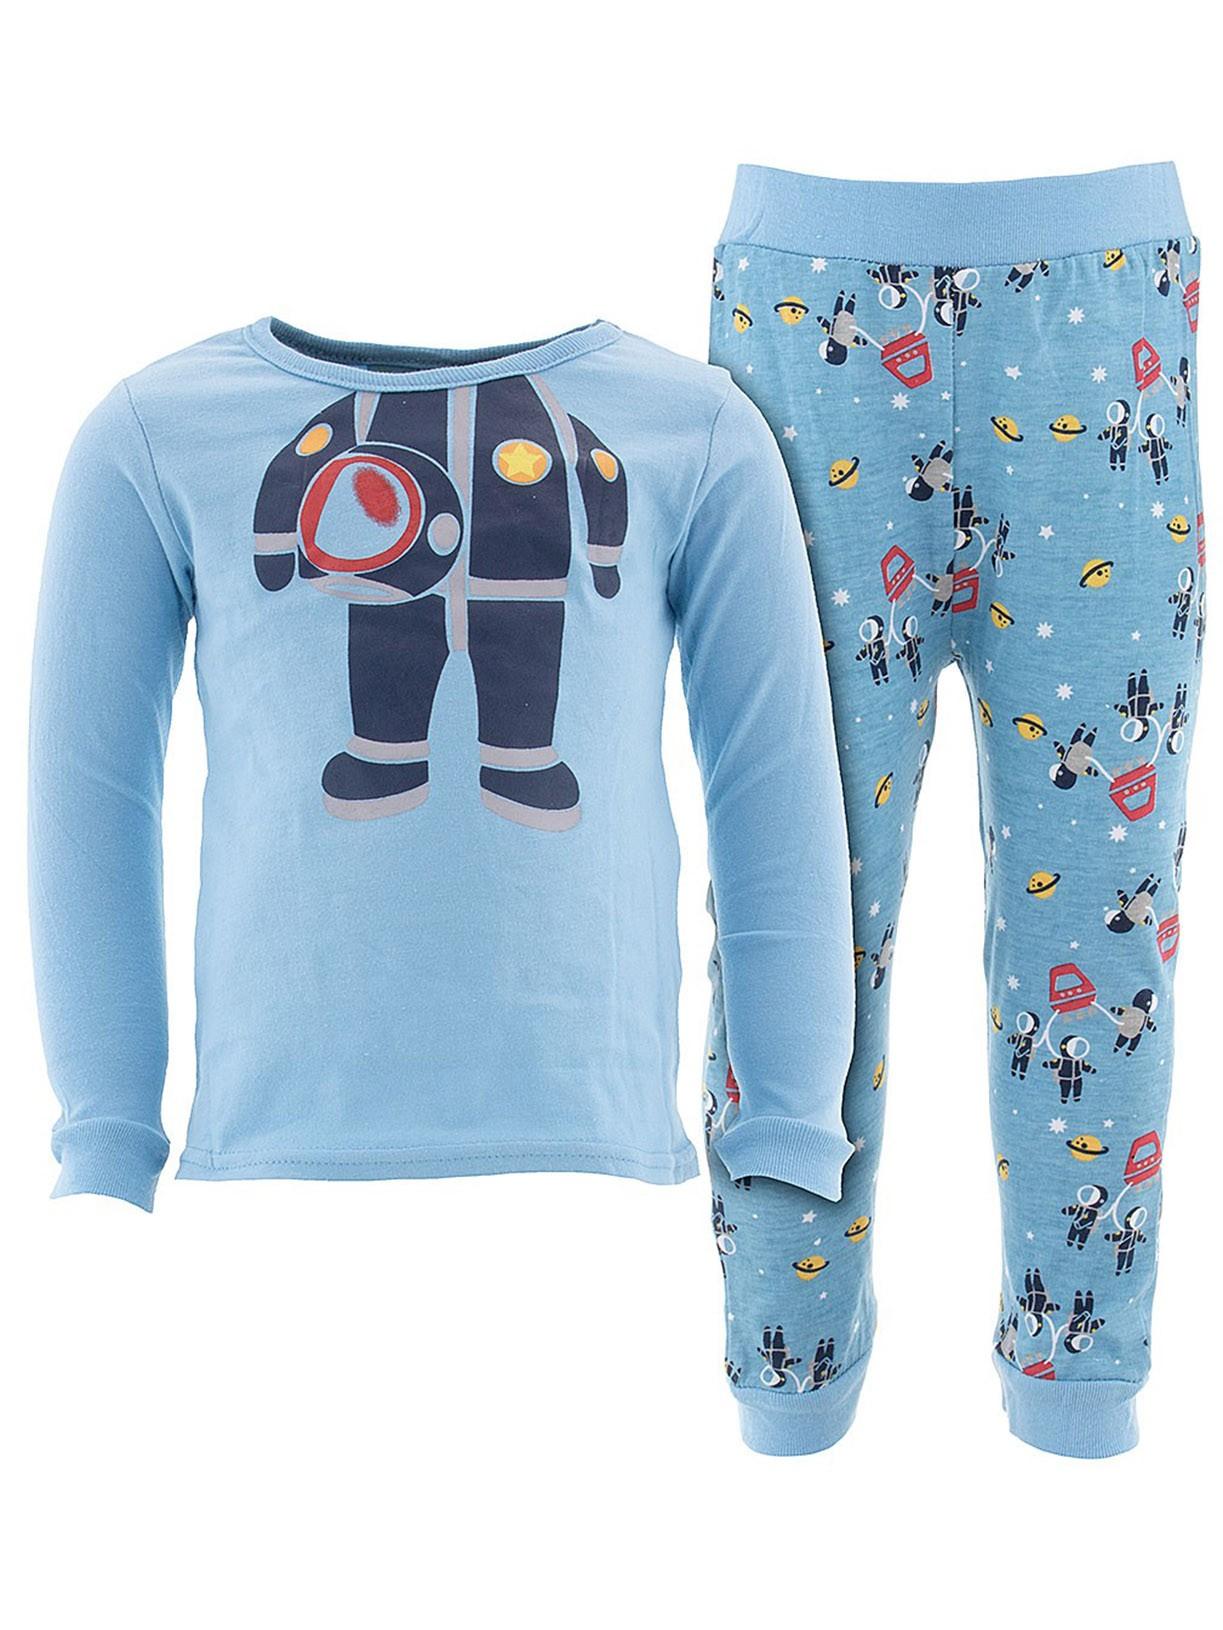 Sweet & Soft Little Boys Blue Astronaut Cotton Pajamas